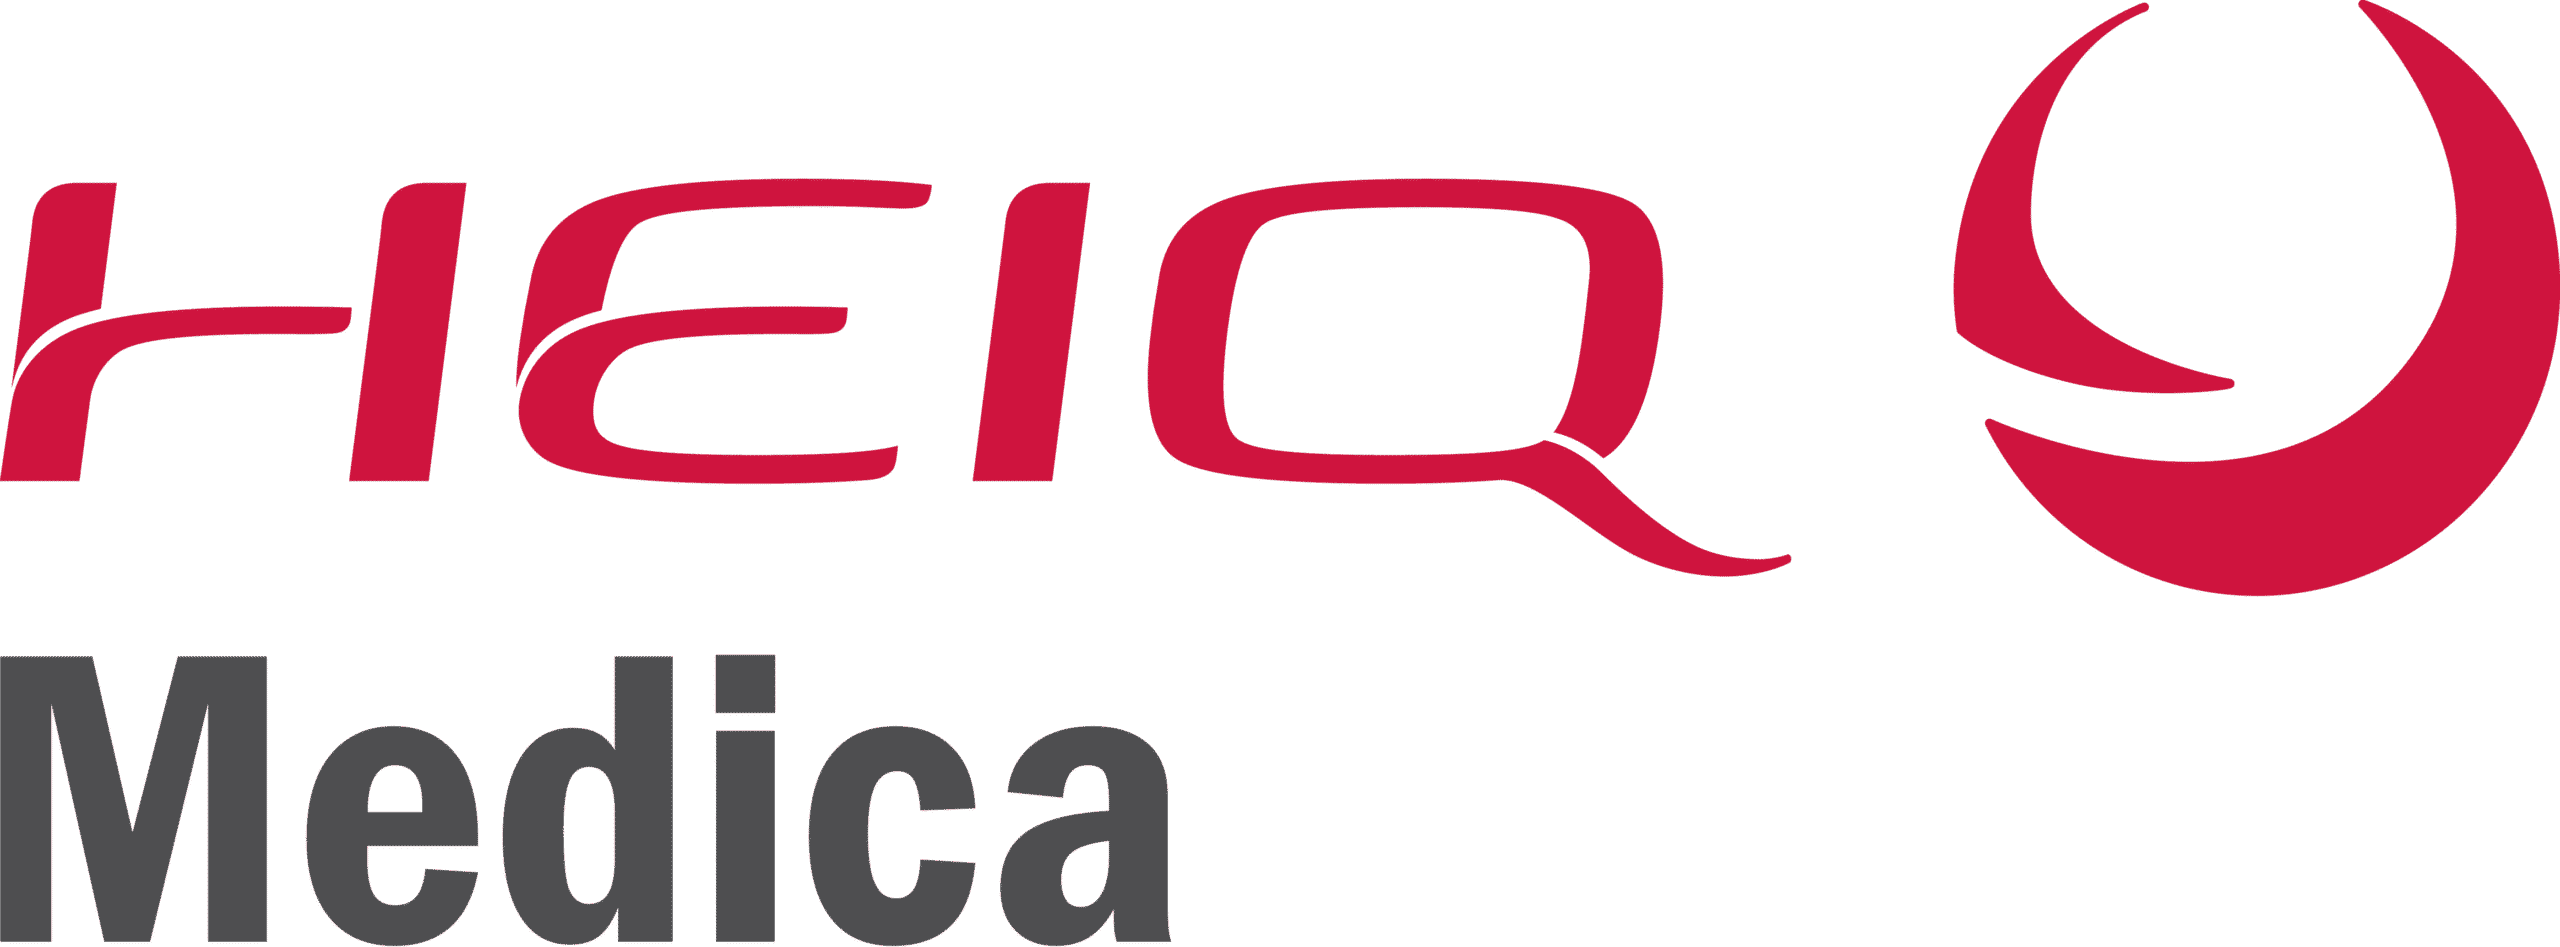 HeiQ Medica logo